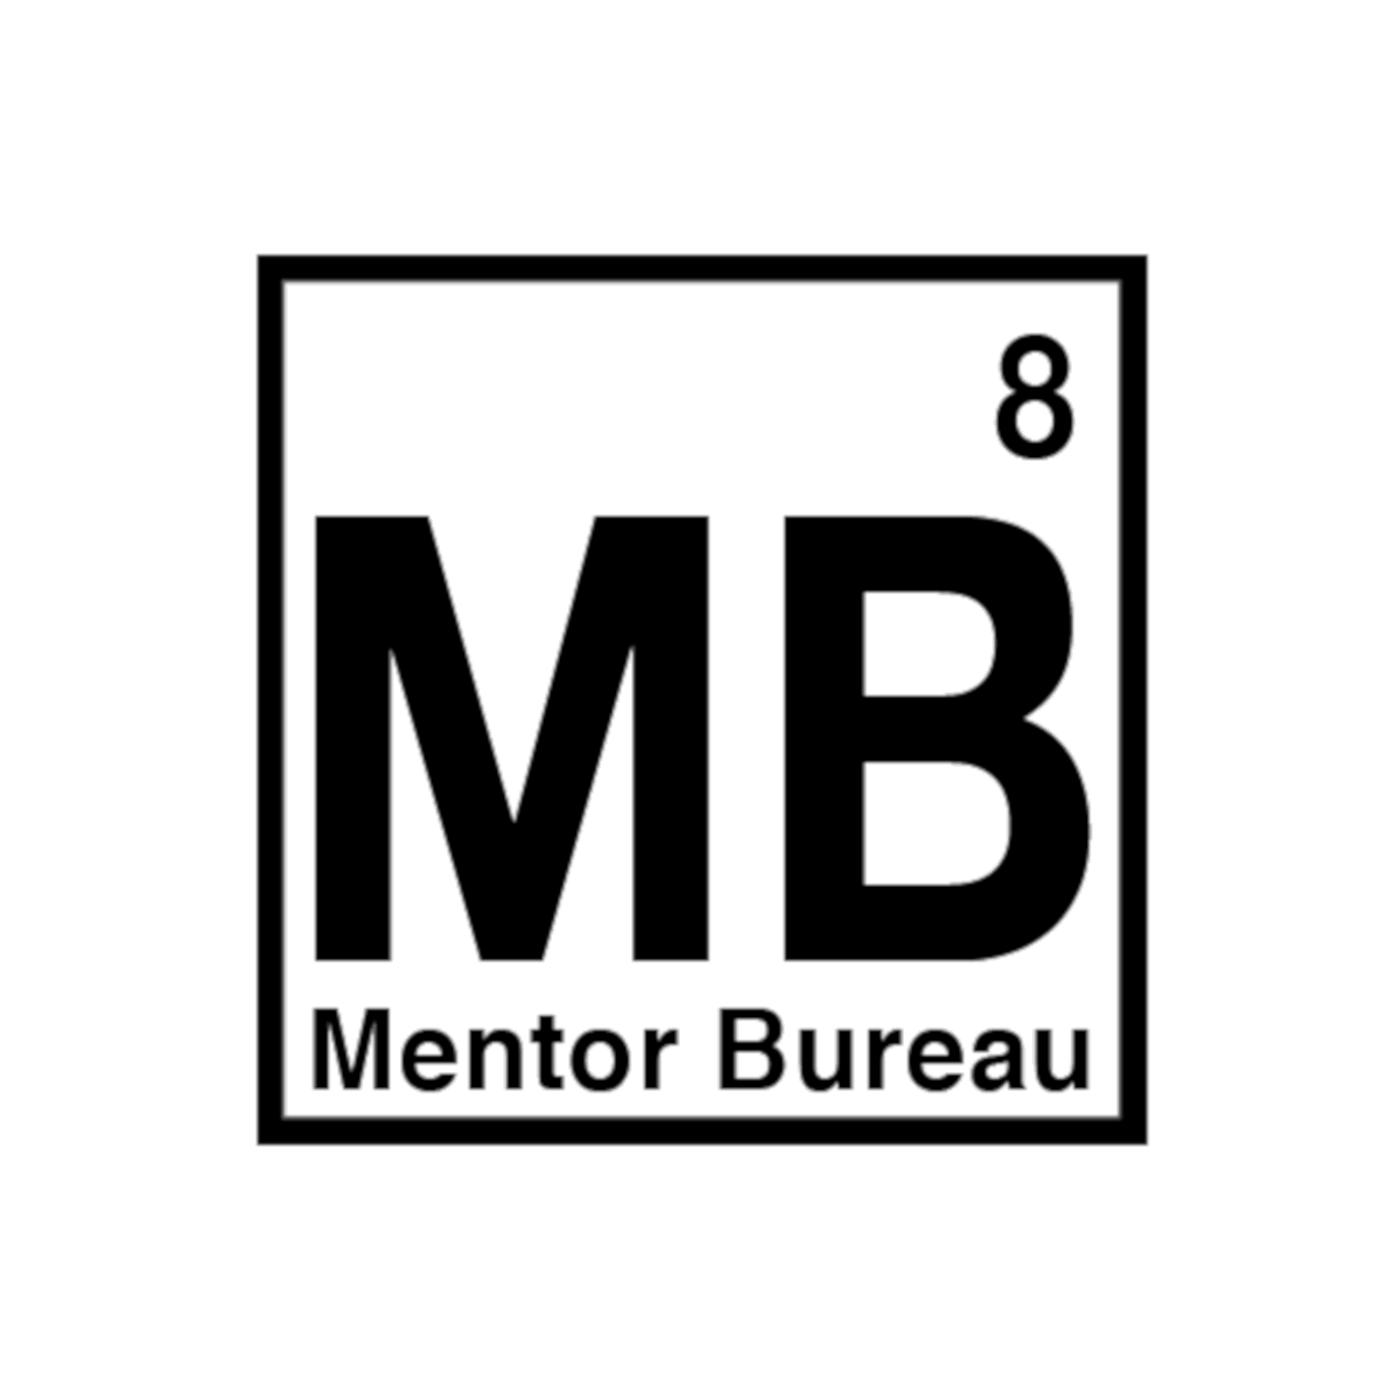 Mentor Bureau's Ecosystem Thinking show art